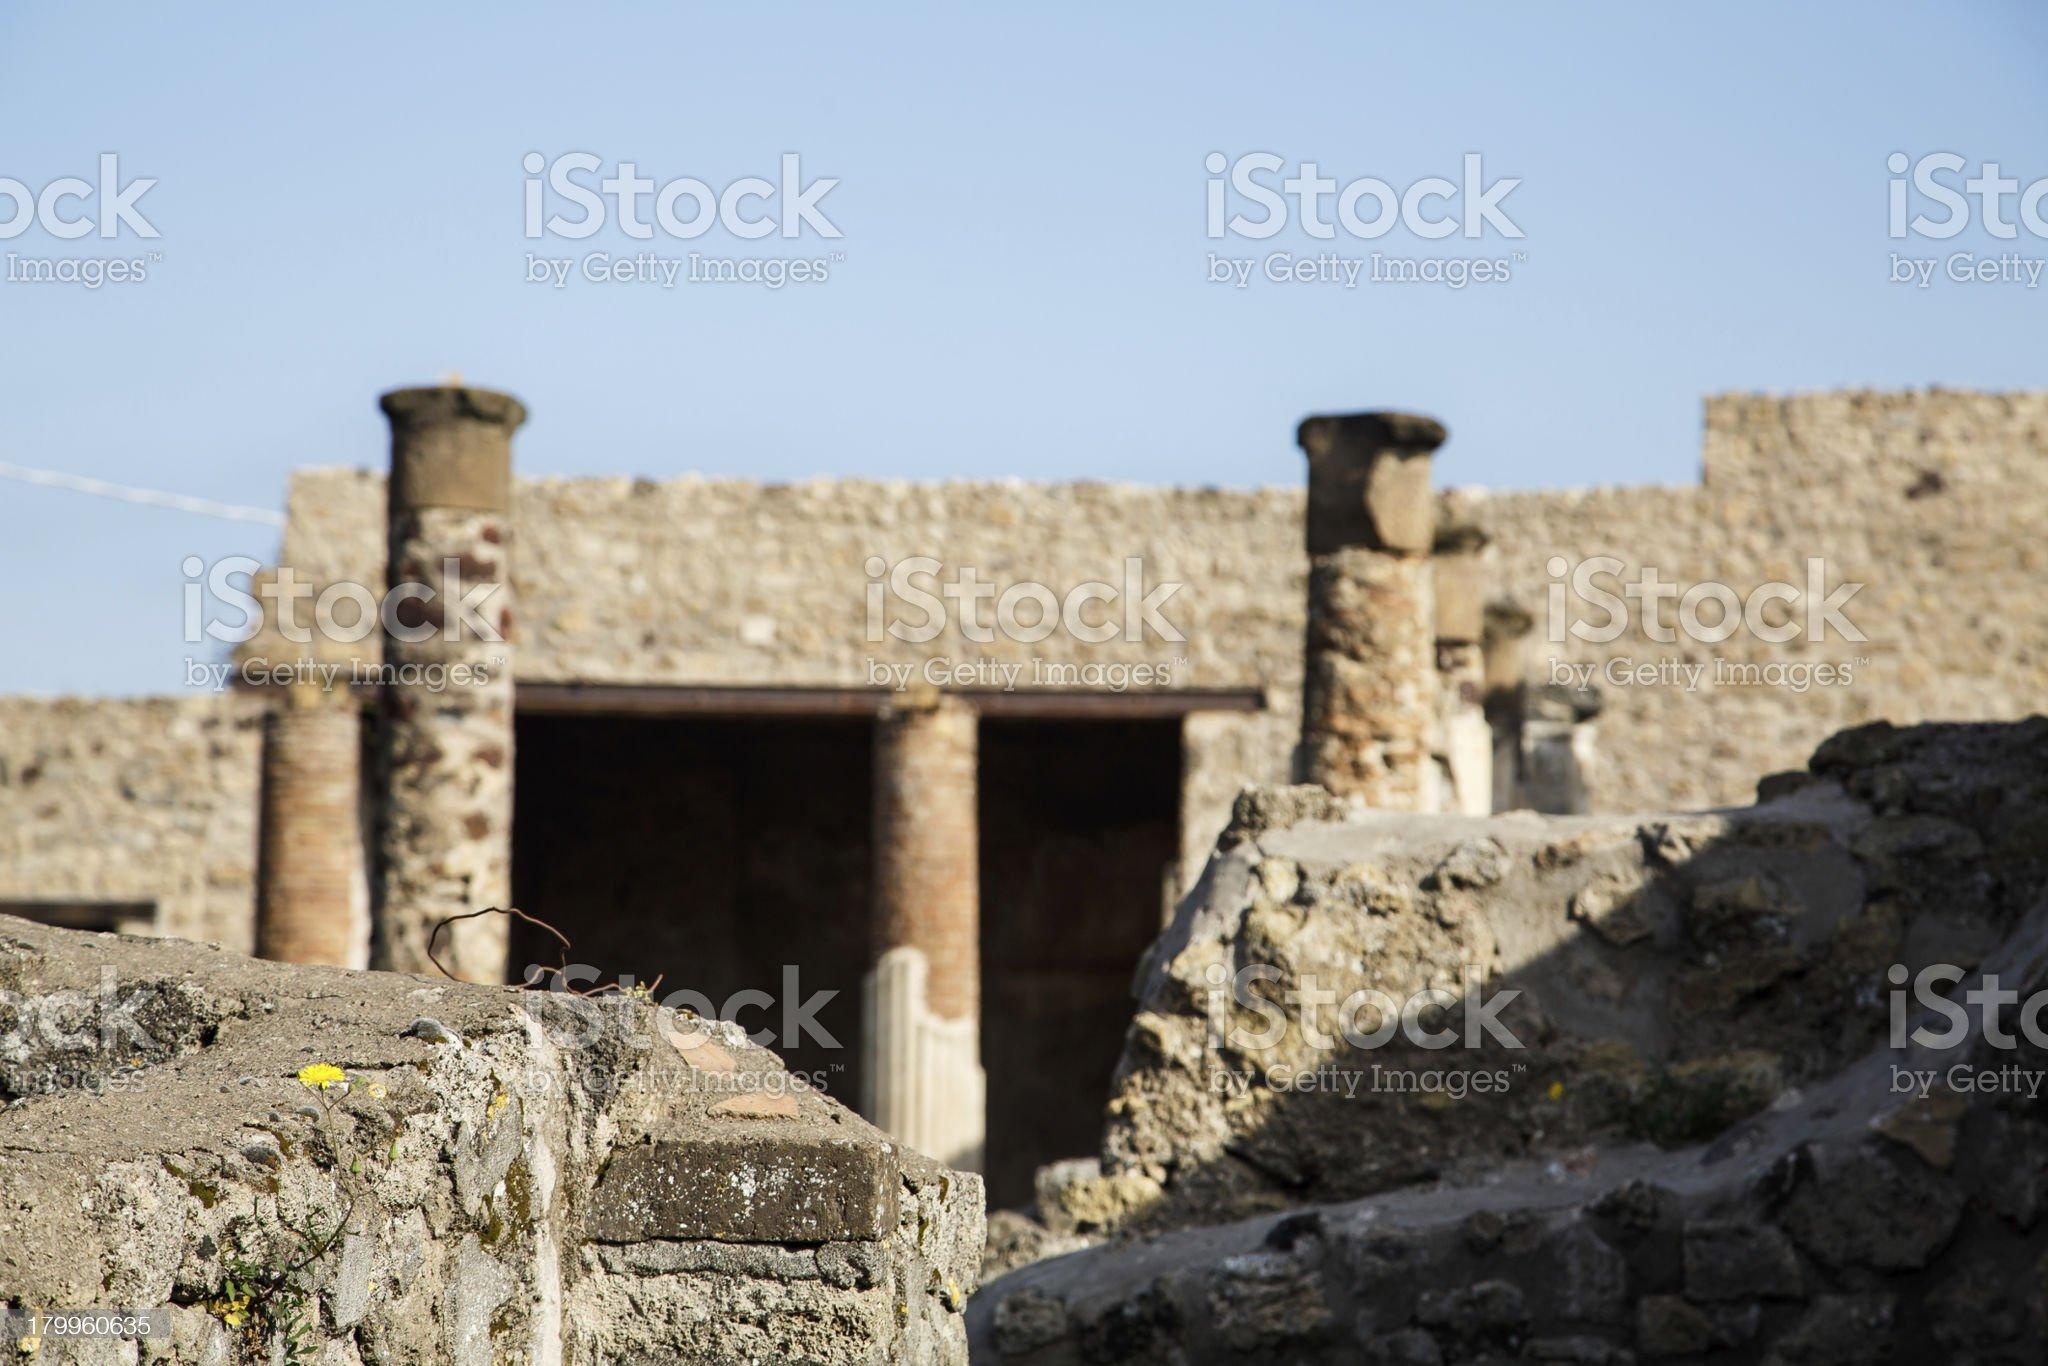 Dandelions Growing in Pompeii Ruins royalty-free stock photo